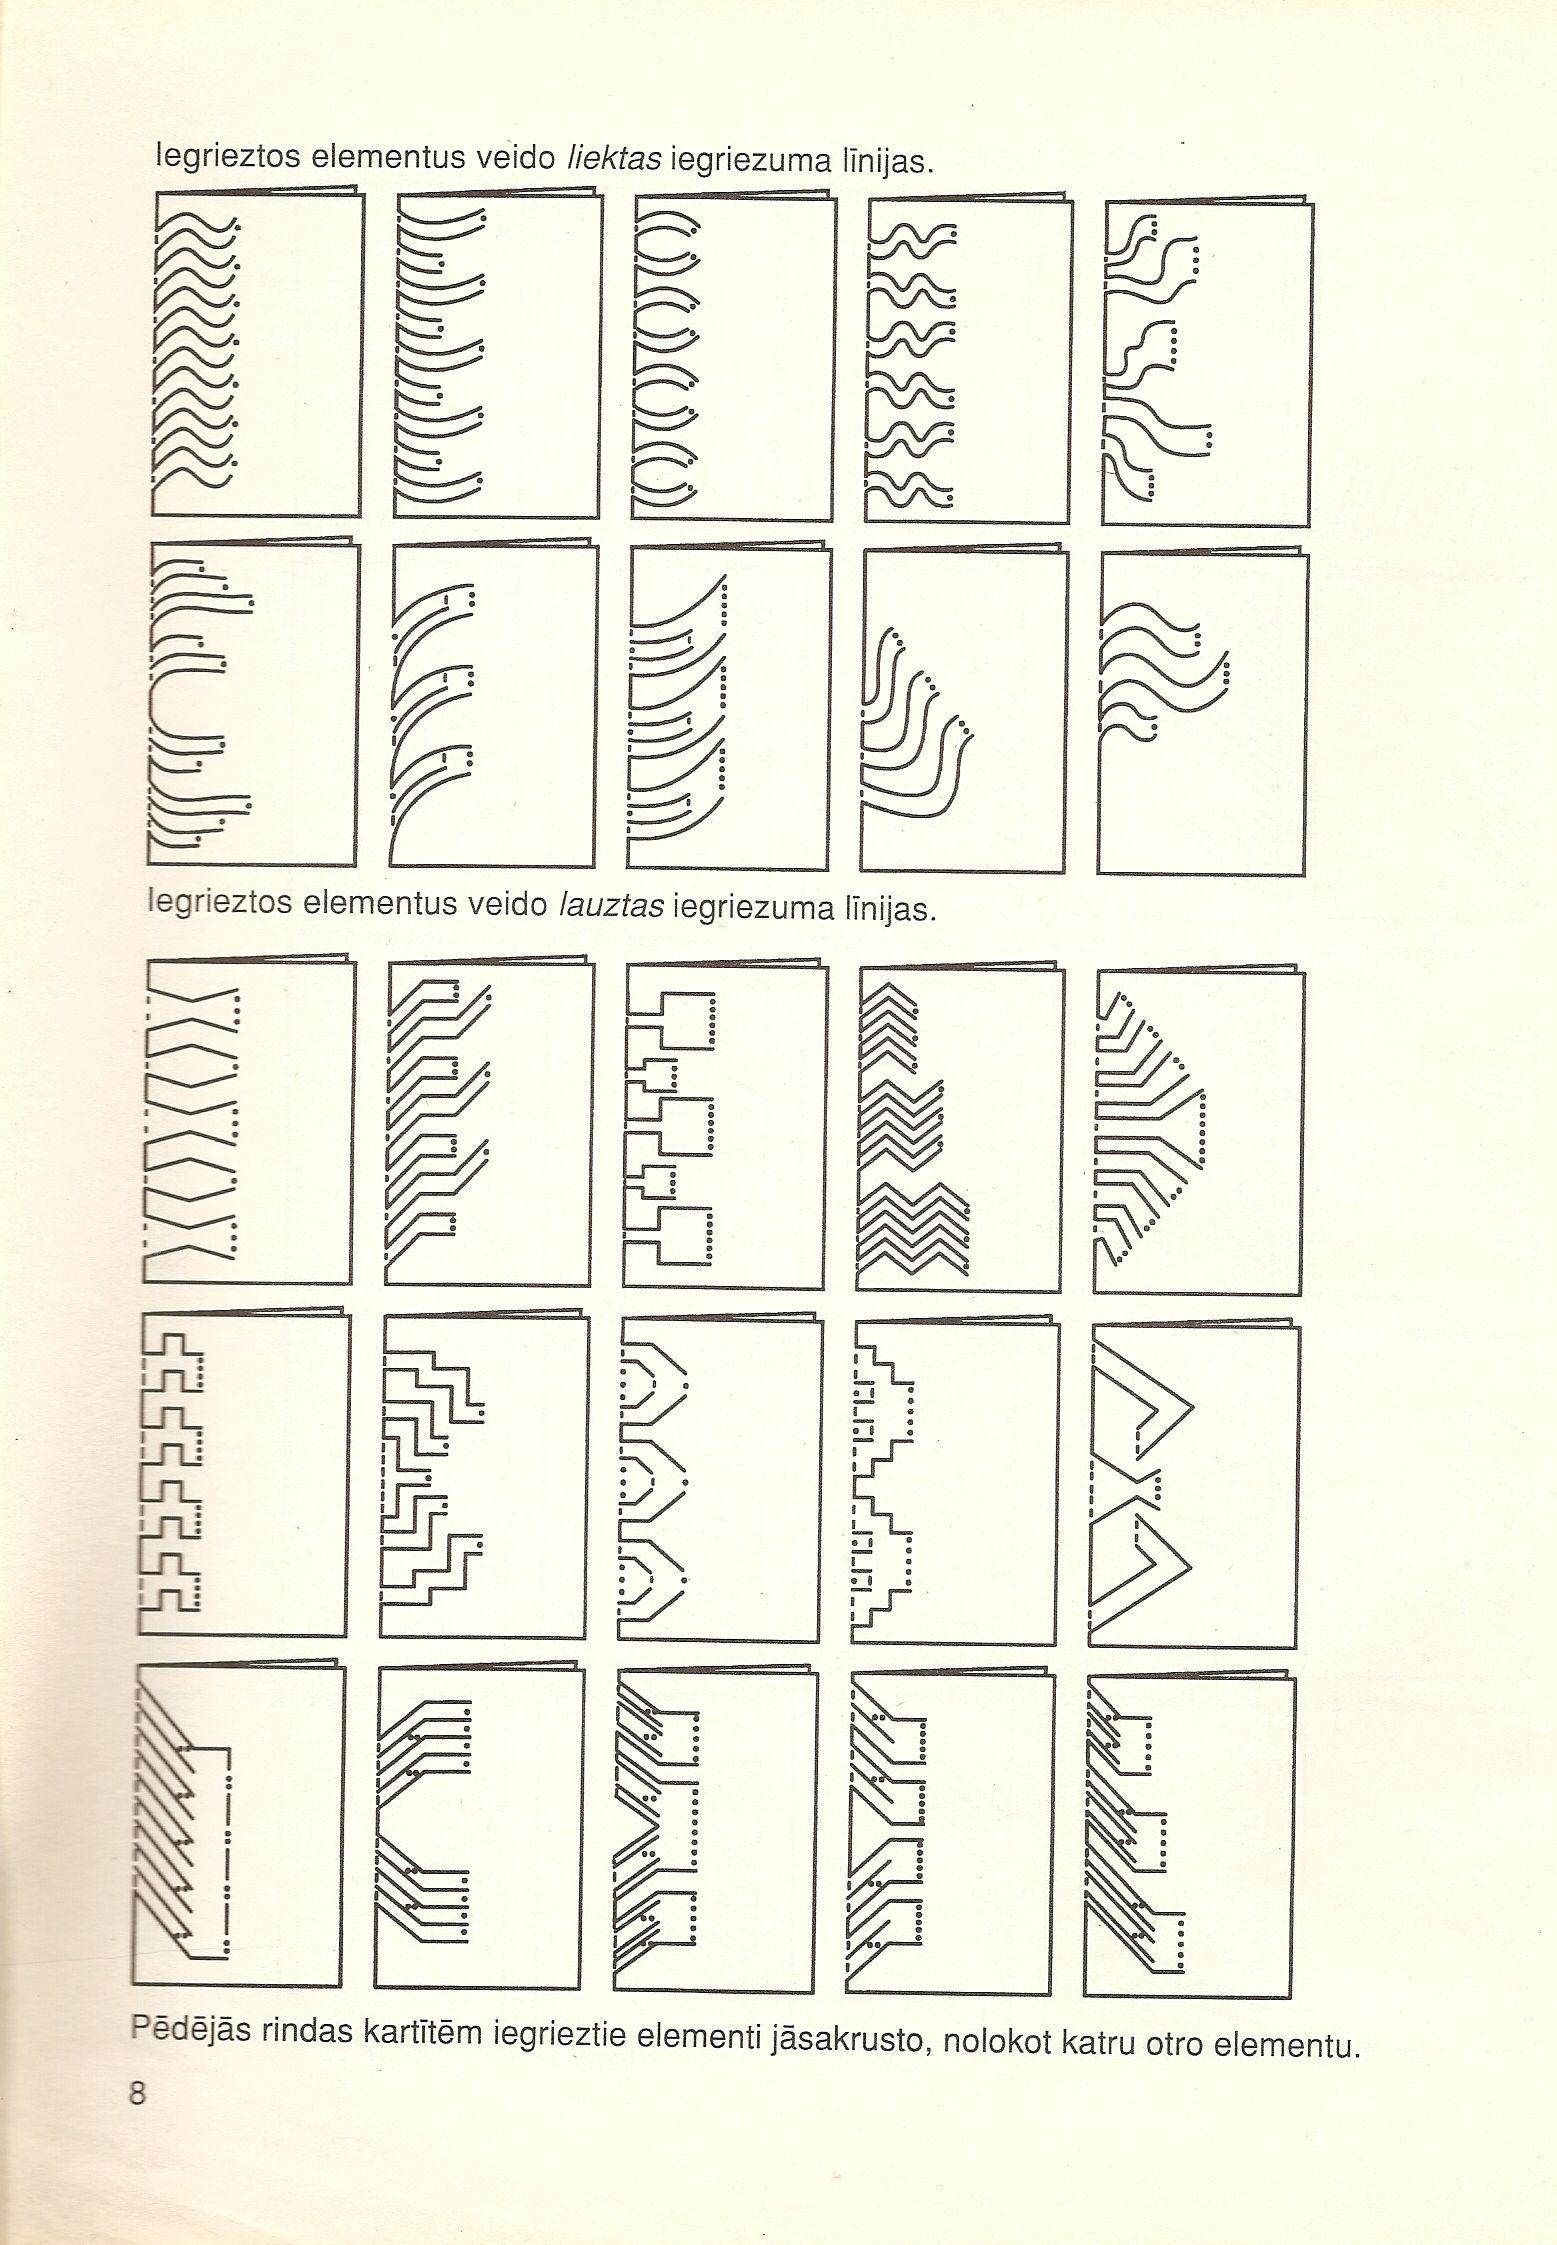 Pin de Agustina Azor en Kirigami | Pinterest | Kirigami plantillas ...